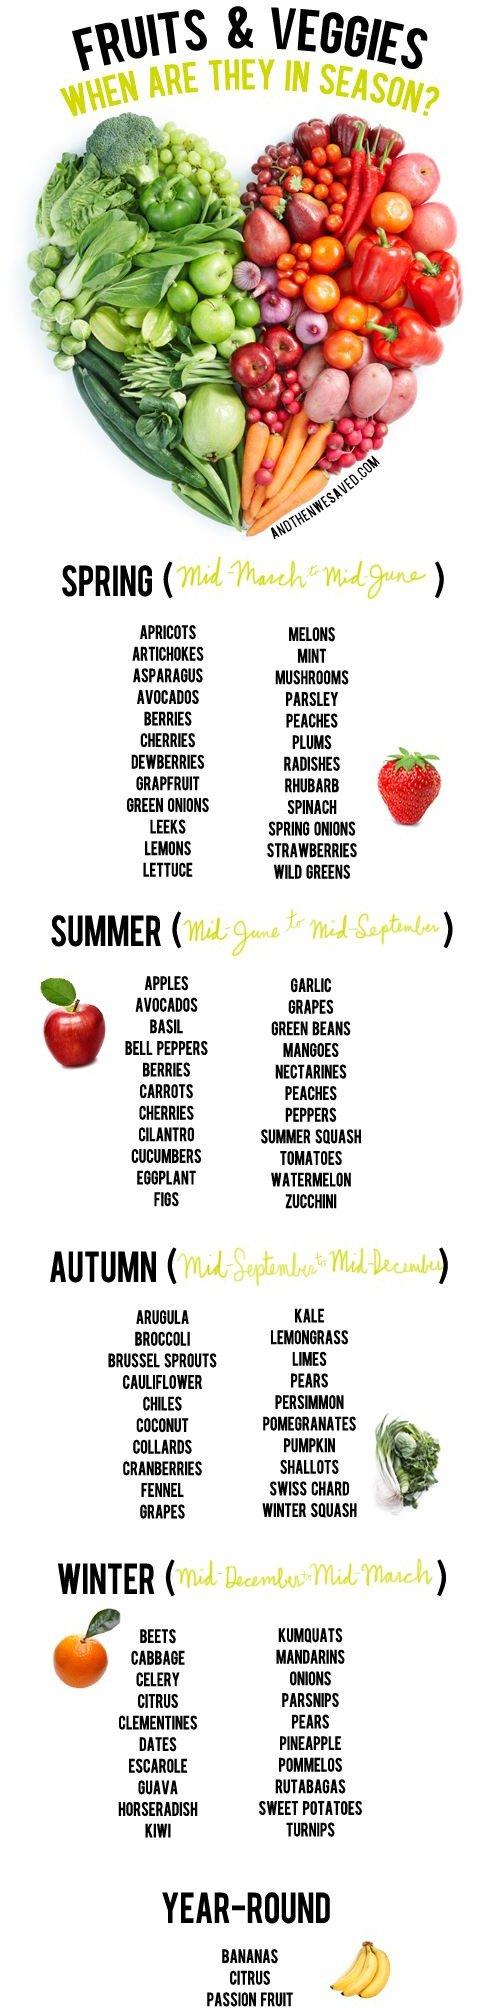 Dietitian,line,food,produce,FRUITS,